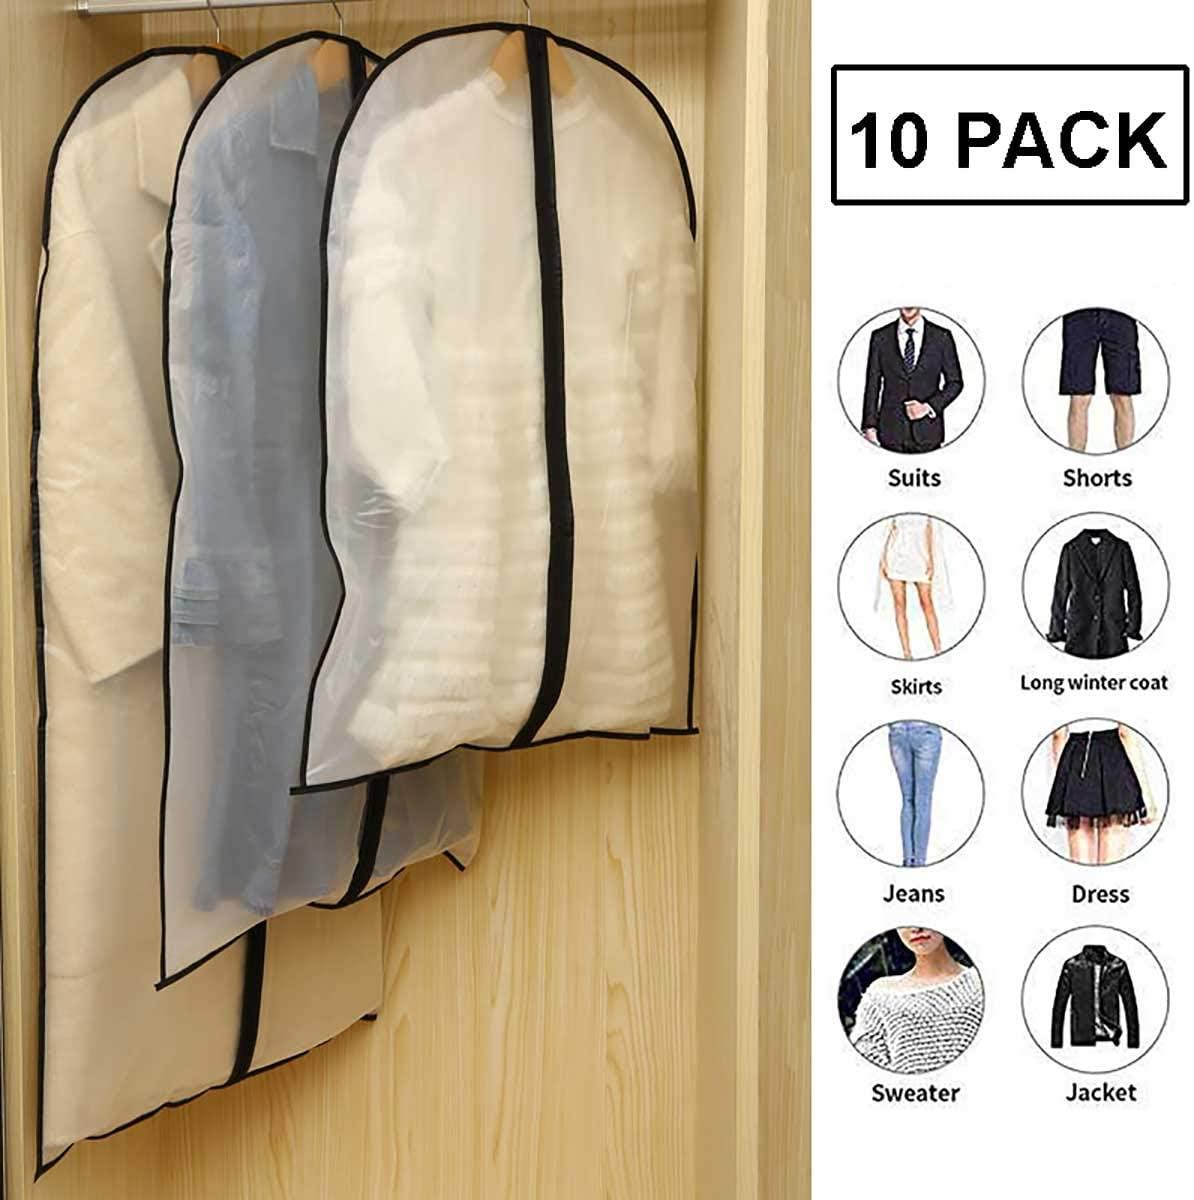 OPYWQS 10 Pcs,PEVA Translucent Matte Texture Clothes Organizer Storage Bag Hanging Garment Dust Covers,Zipper,Foldable,for Wardrobes,Zipper,24